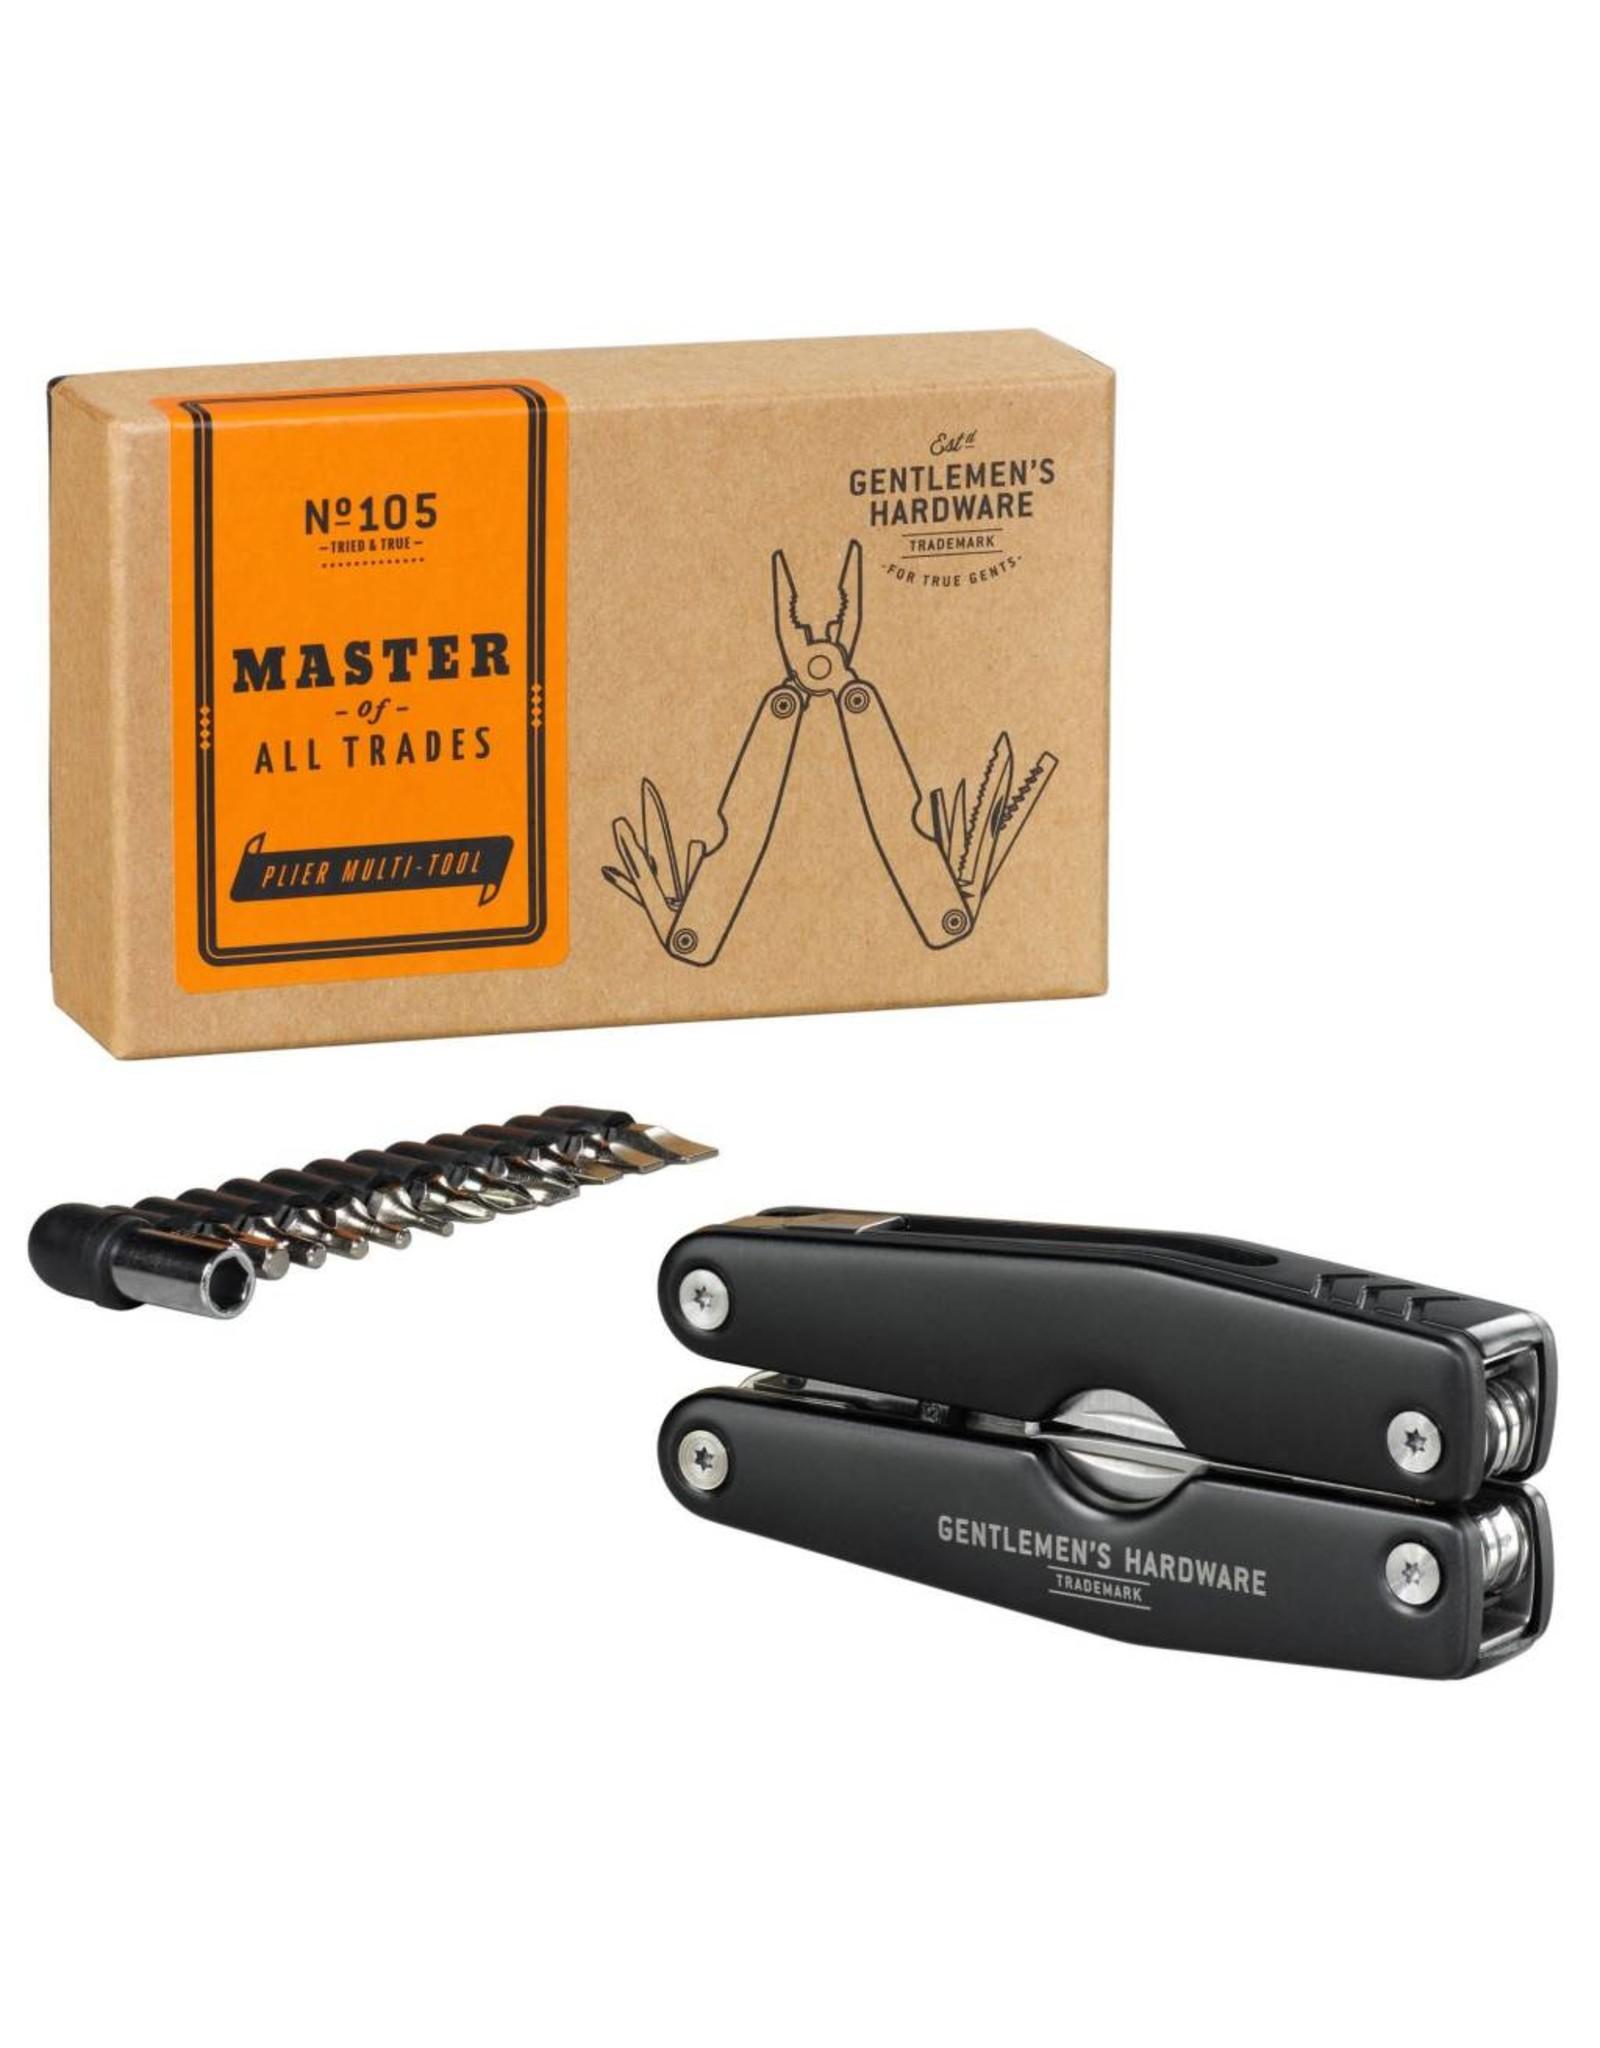 Gentleman's Hardware Plier & Screwdriver Multi Tool